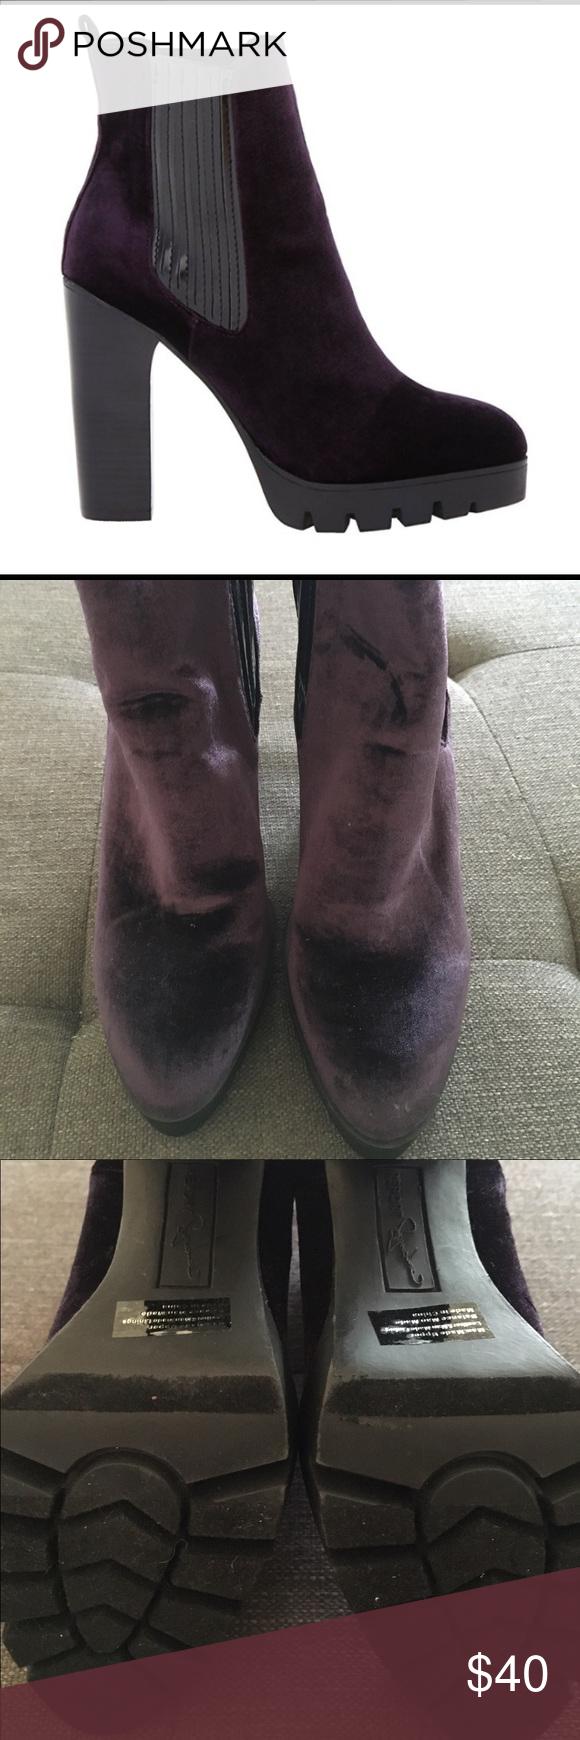 8ec5d2a5d Report Signature Polk Chelsea Boot Deep purple velvet-like soft high ankle  bootie. Pull